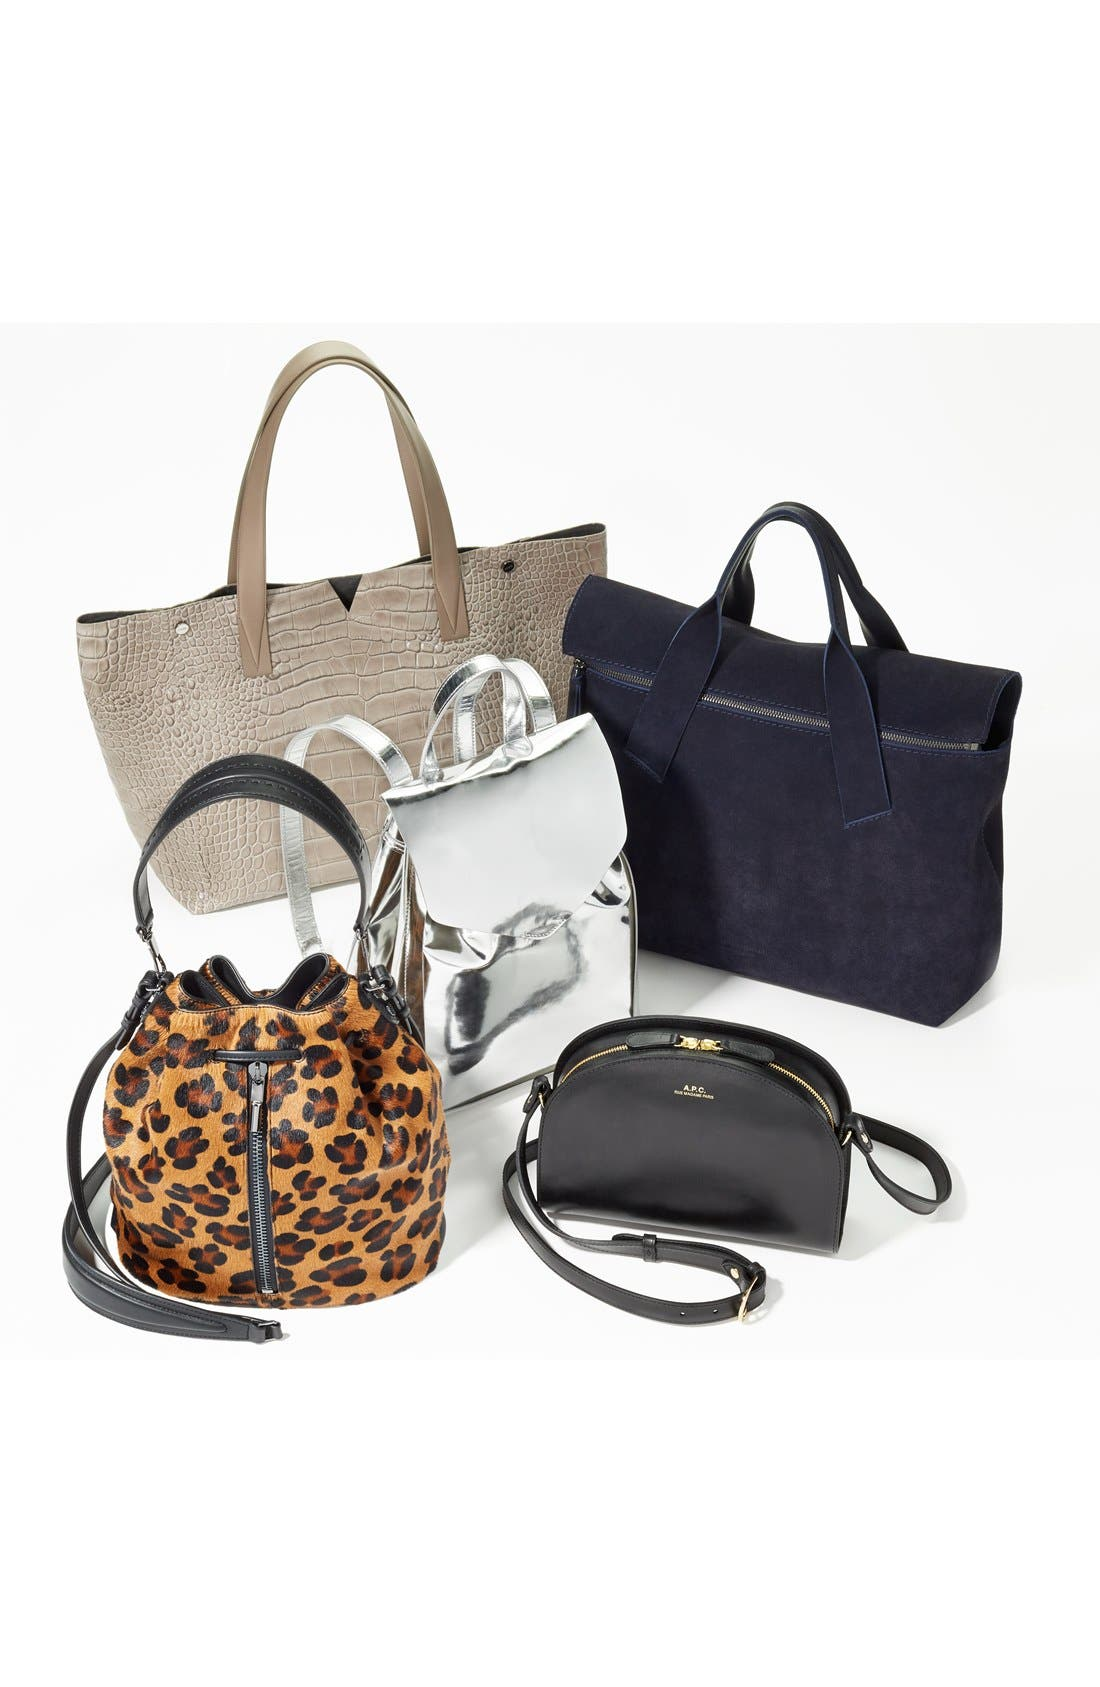 'Sac Demi Lune' Leather Crossbody Bag,                             Alternate thumbnail 8, color,                             NOISETTE